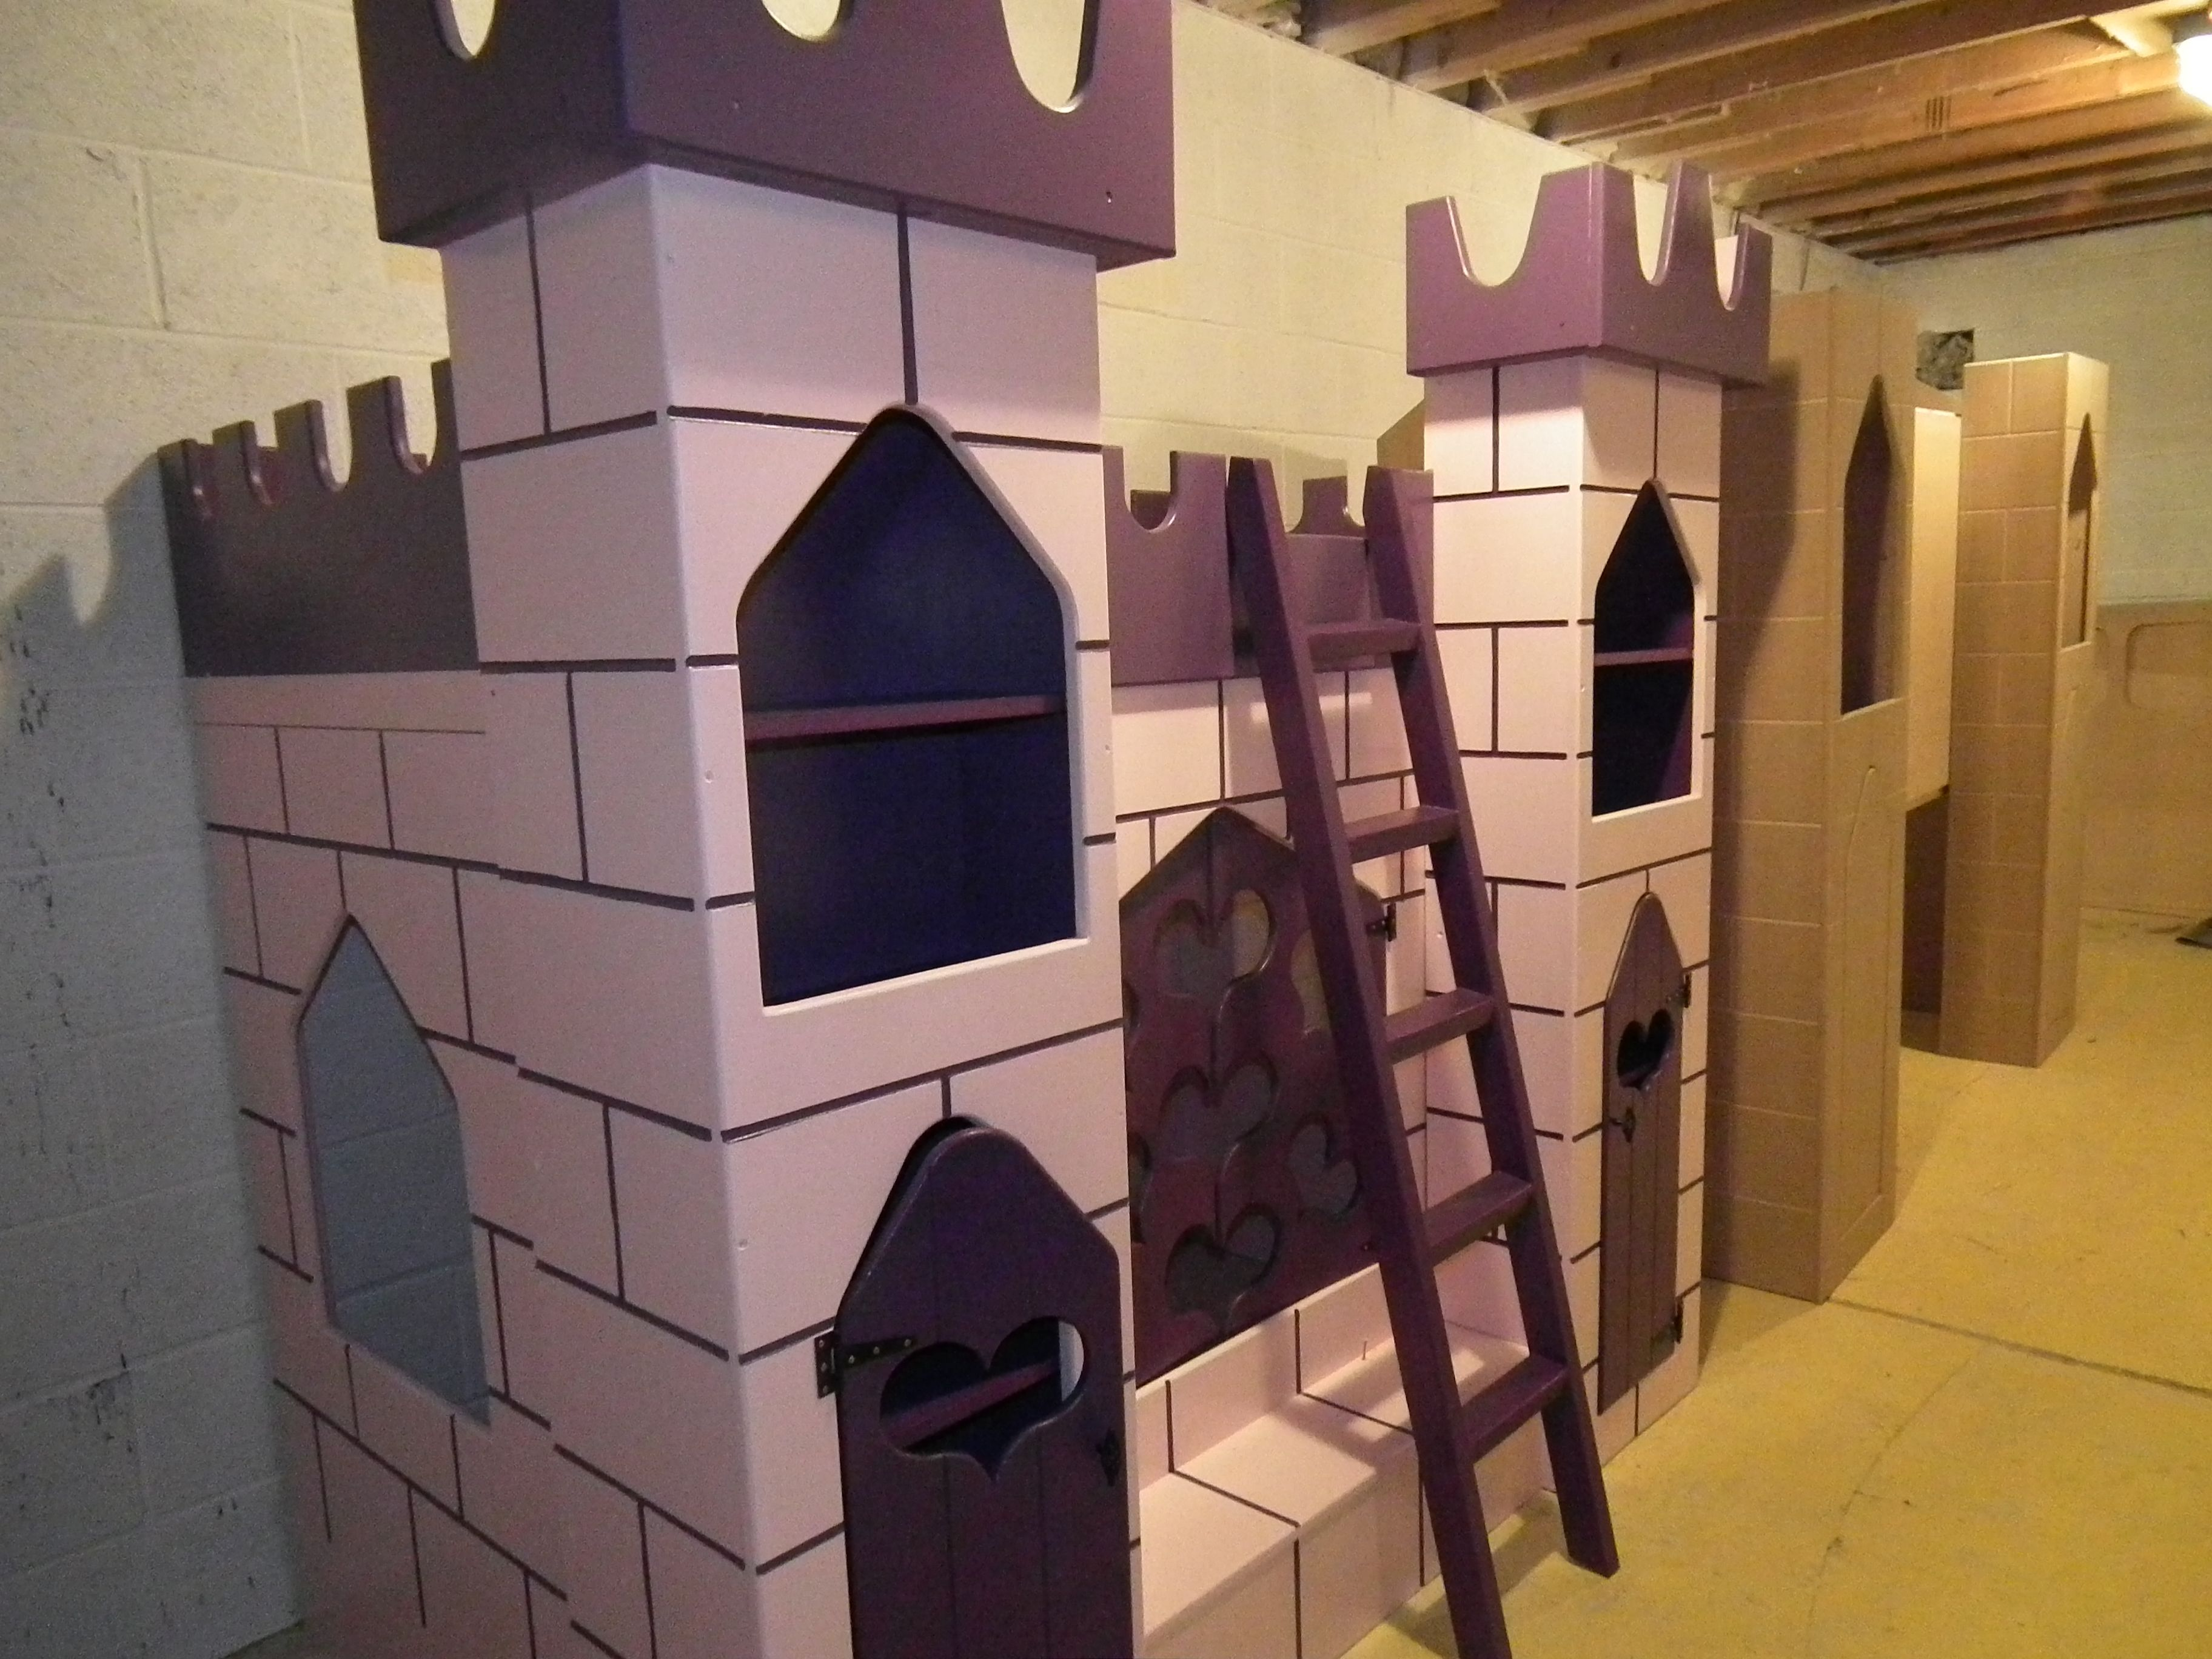 Princess Castle Bedroom Furniture Wwwfacebookcom Dreamcraftfurniture Dreamcraft Furniture Pink